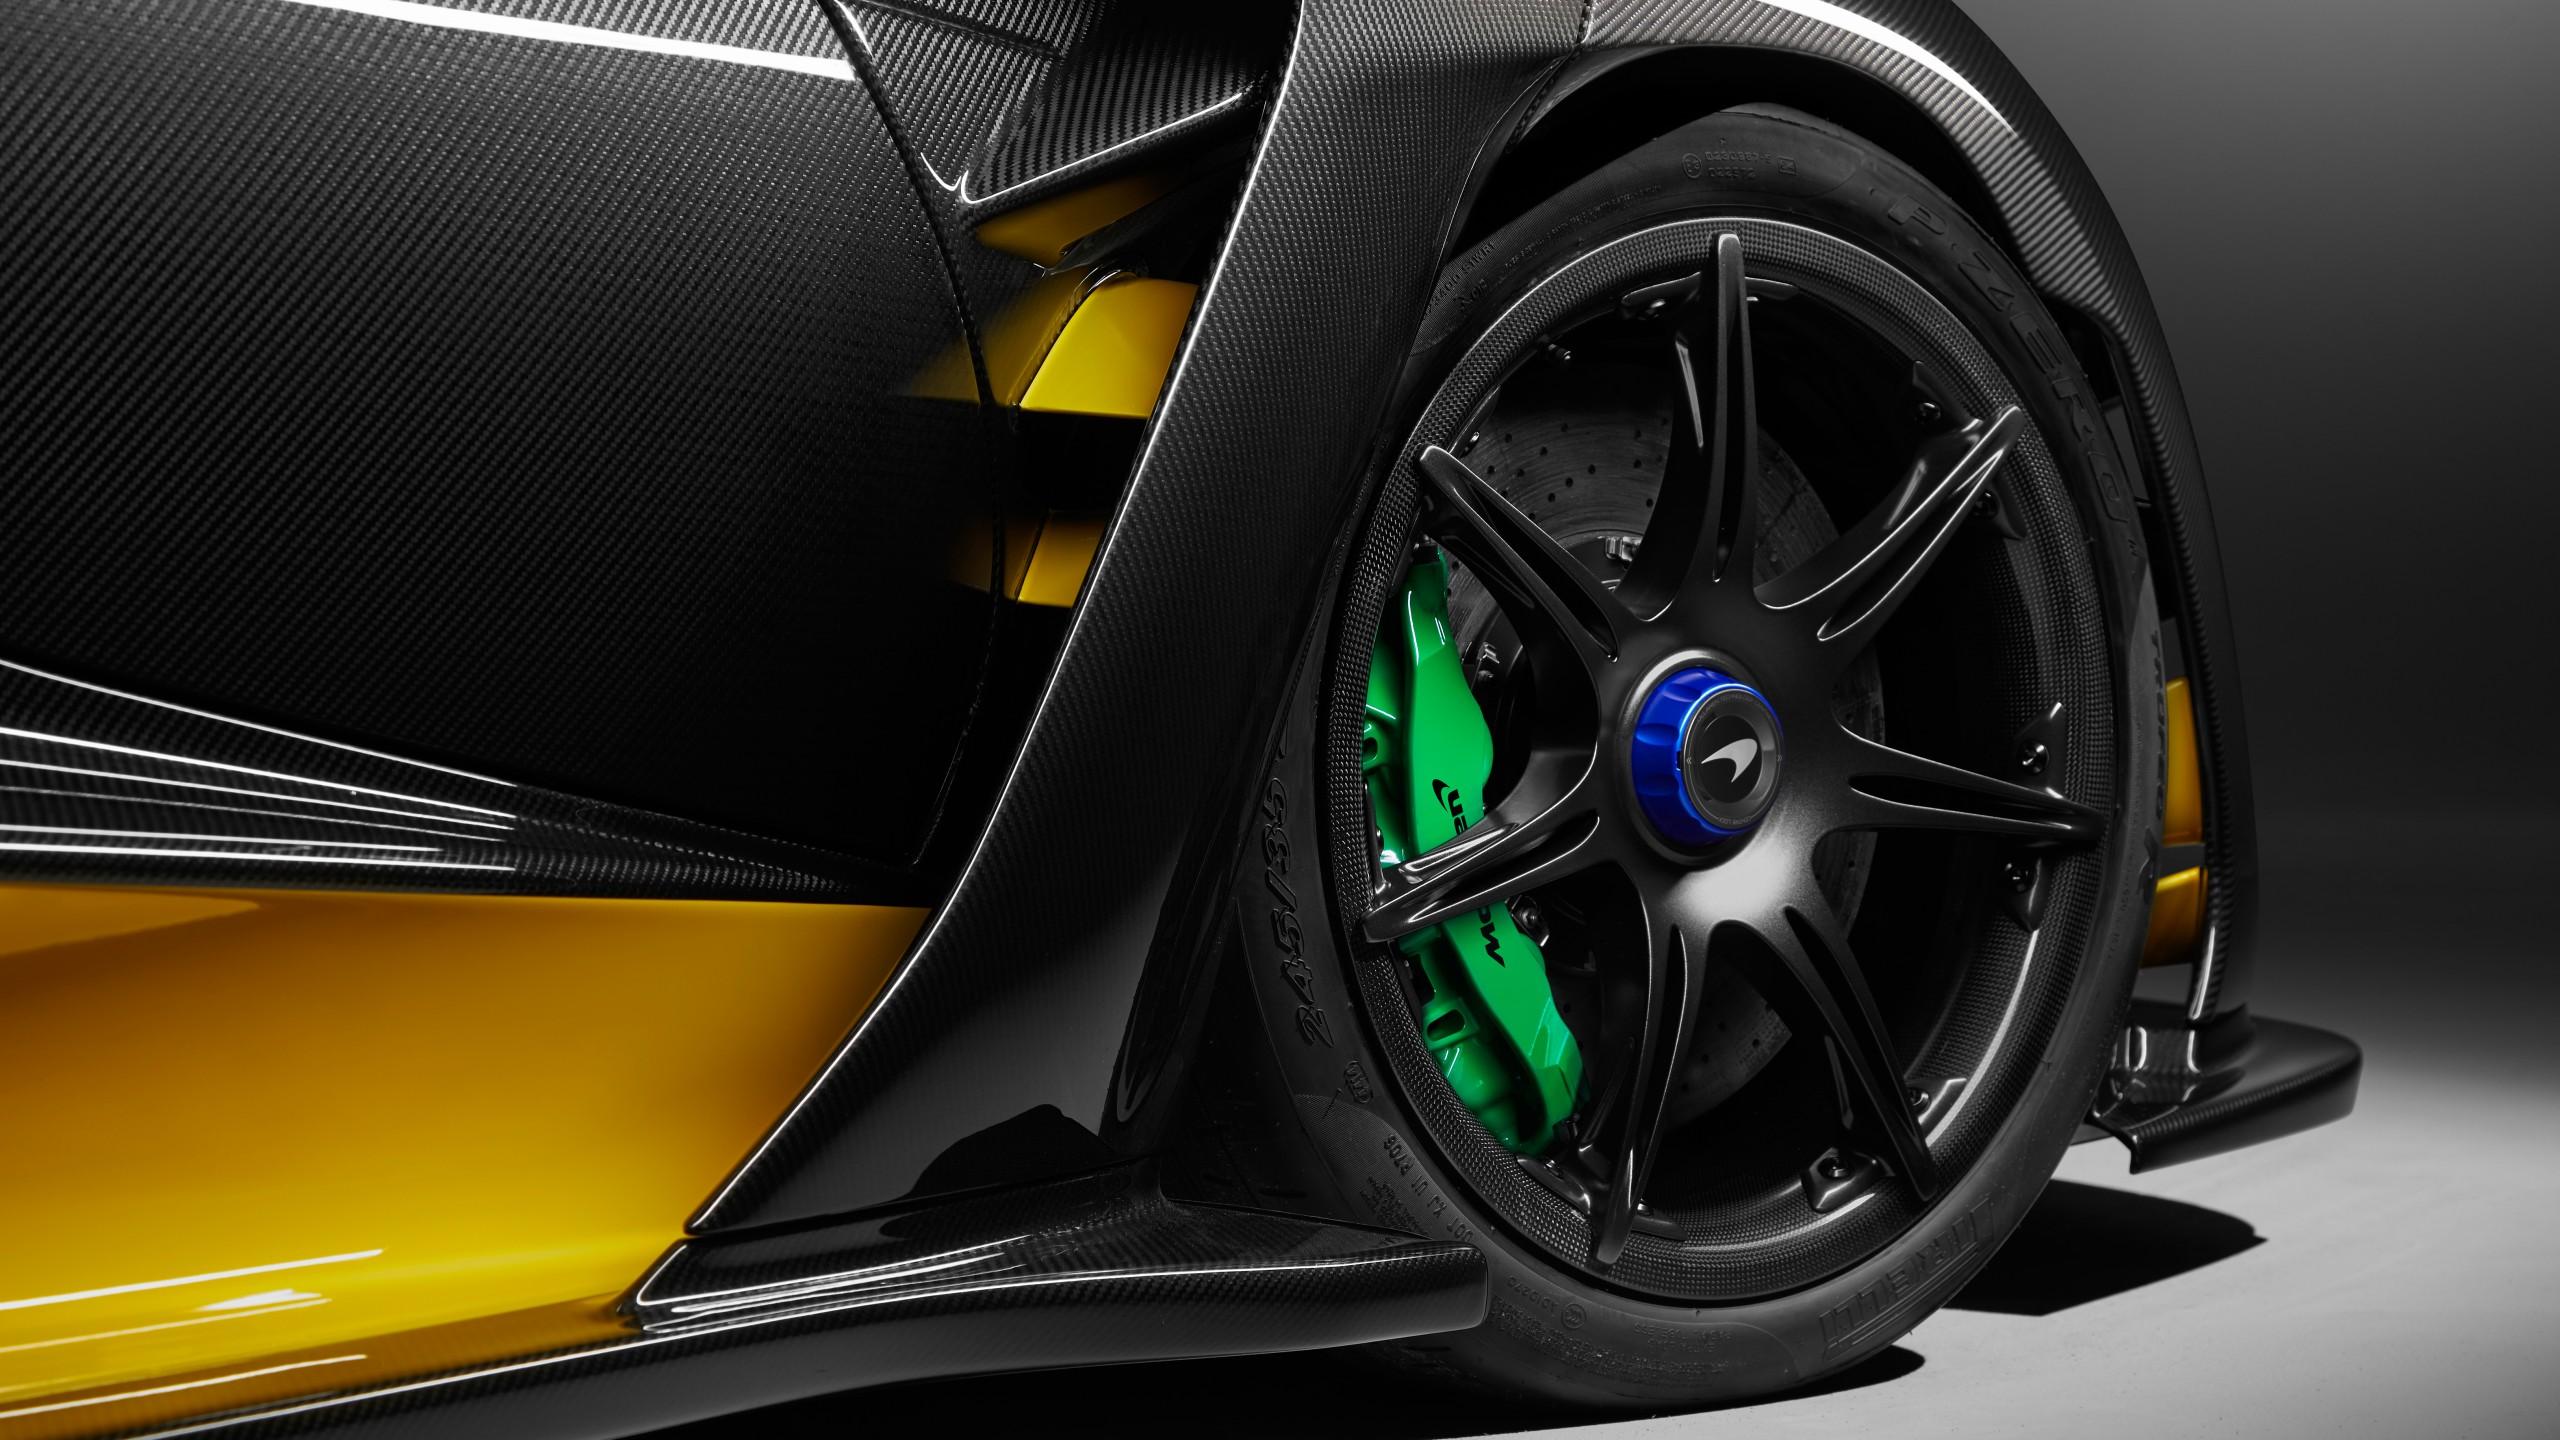 Mclaren Senna Carbon Theme By Mso 5k Wallpaper Hd Car